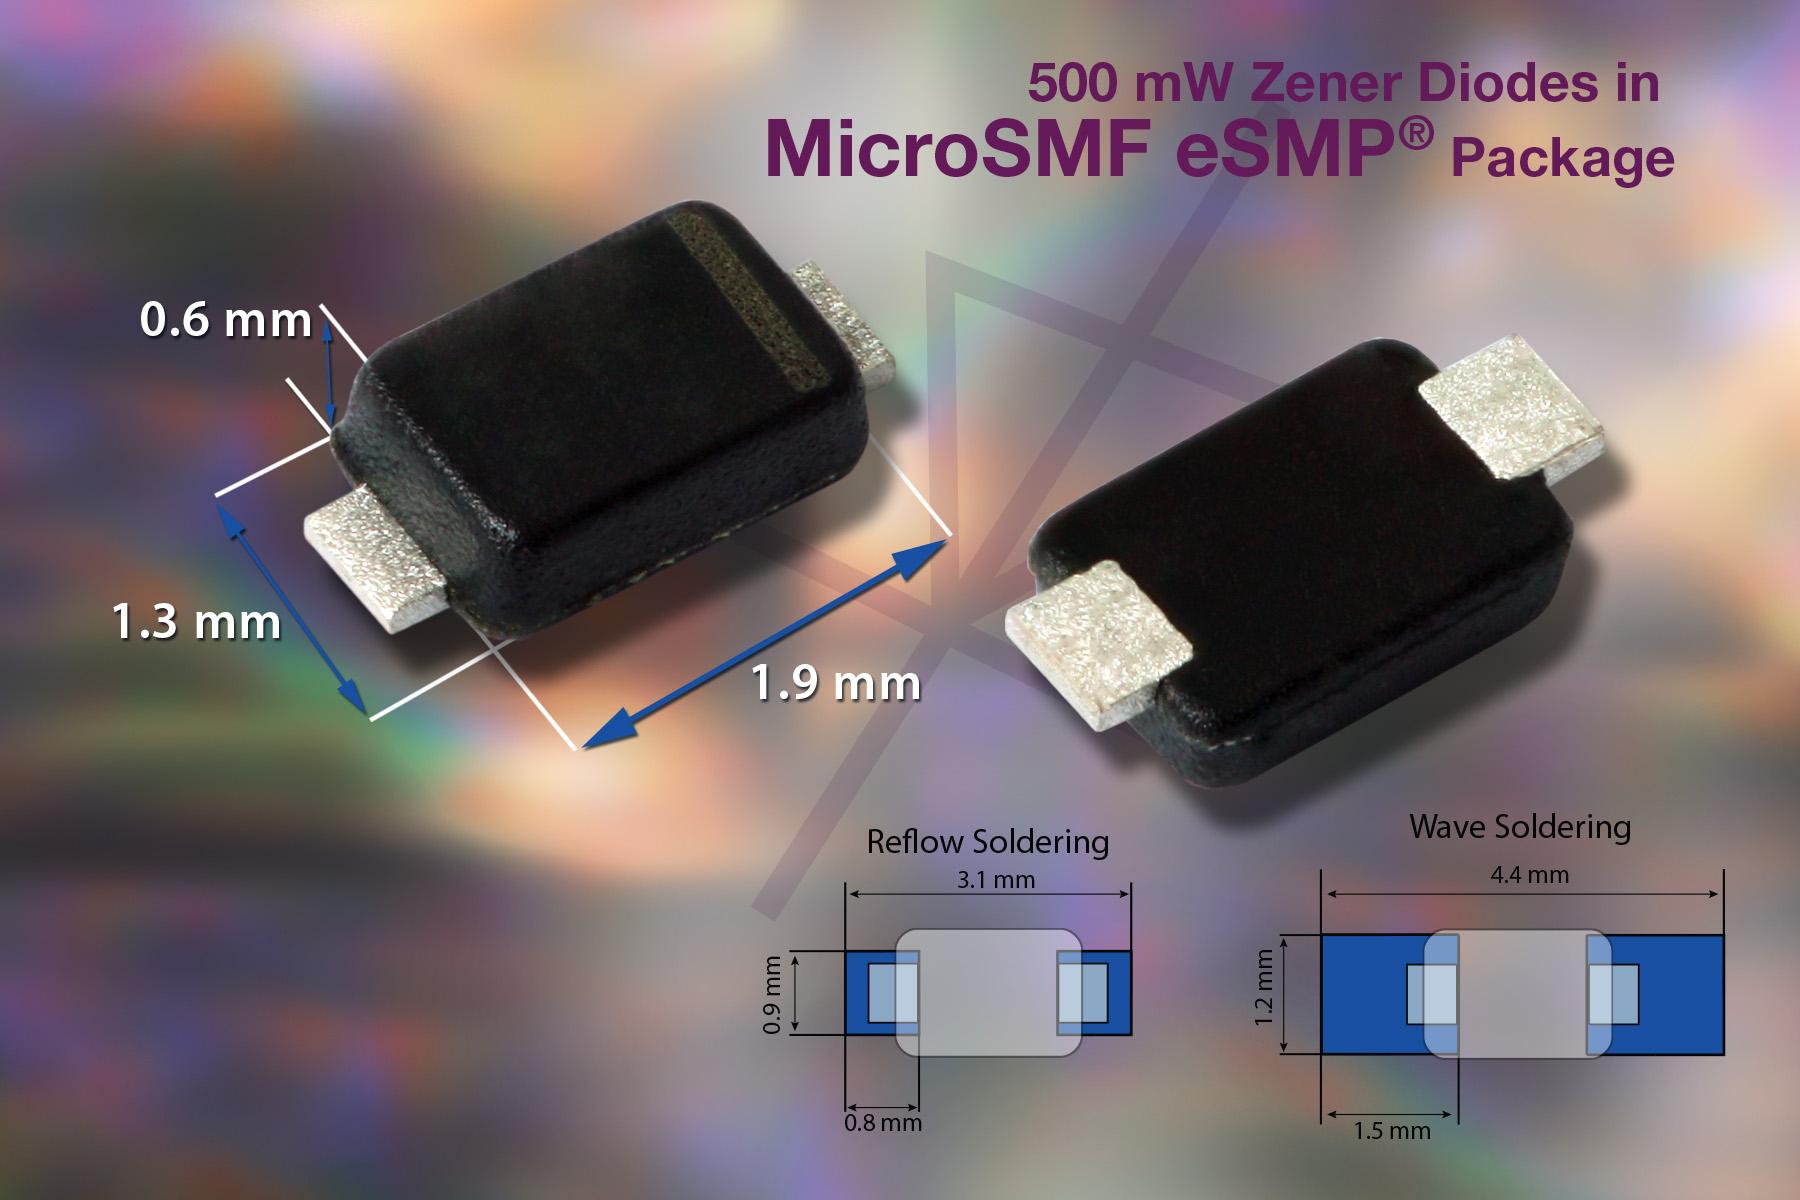 WPIg_Smartphone_Vishay_141015_Photo - Diodes - PLZ-Series - PR0578